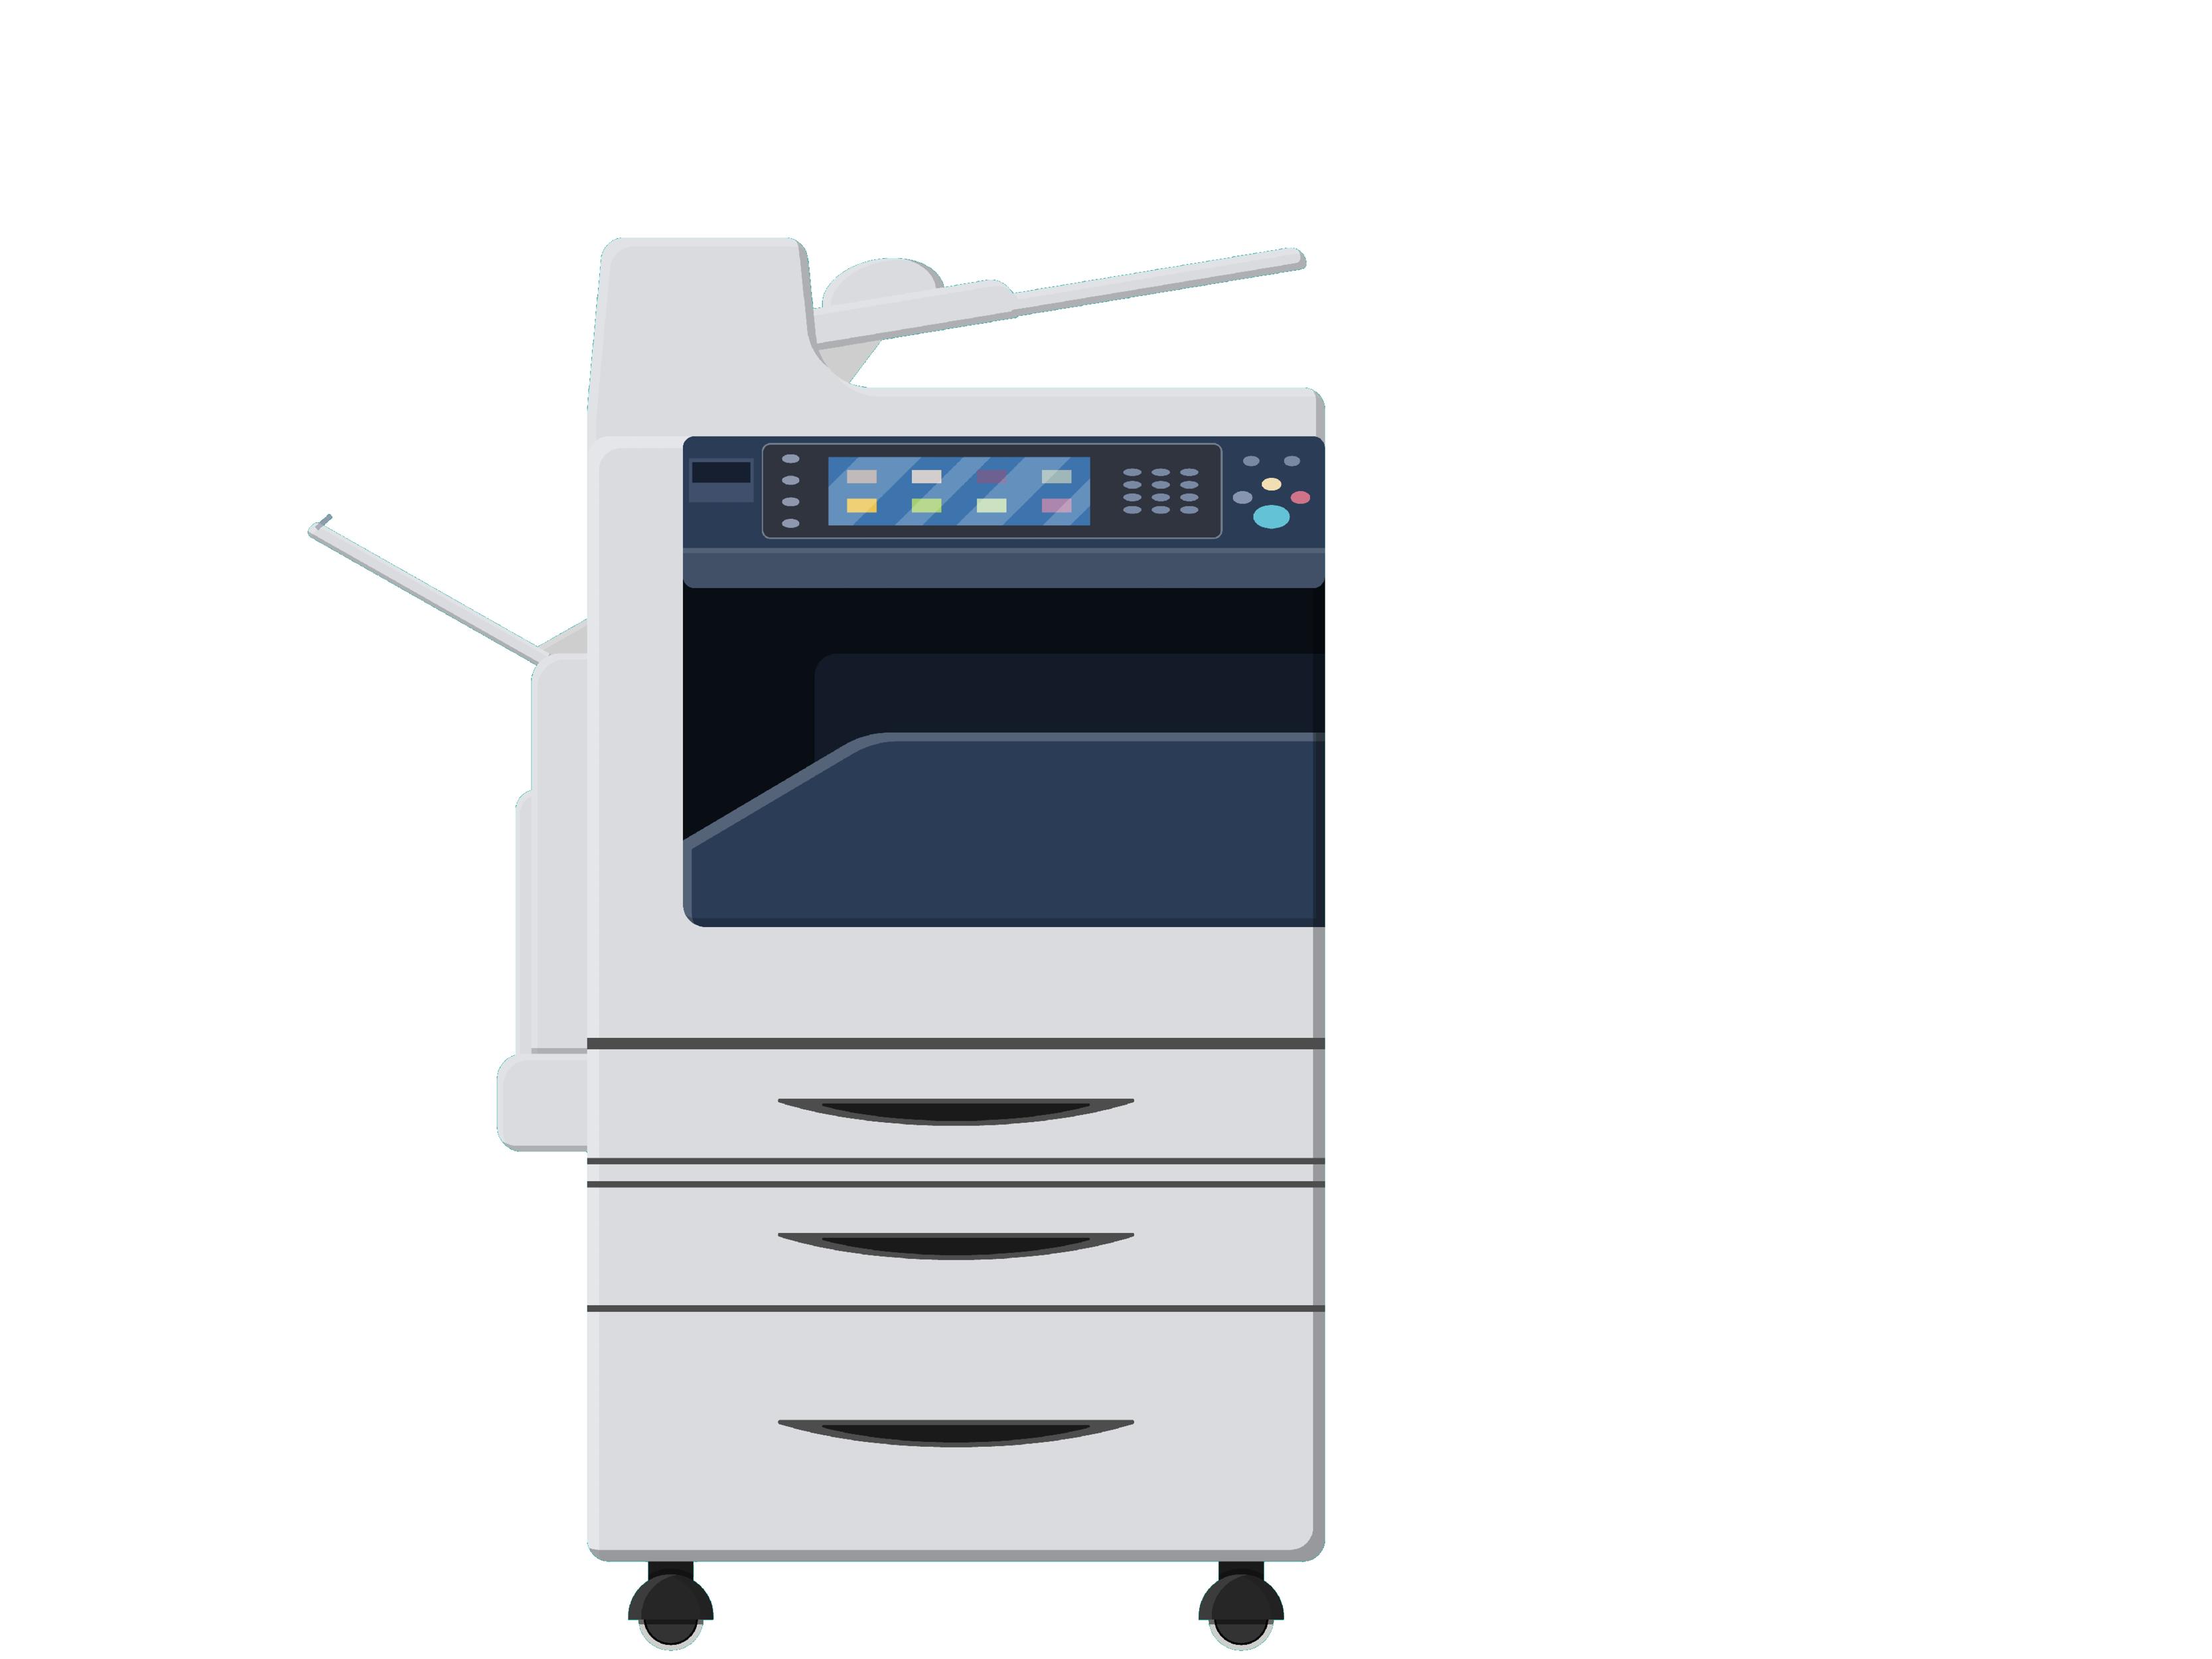 MFP Device